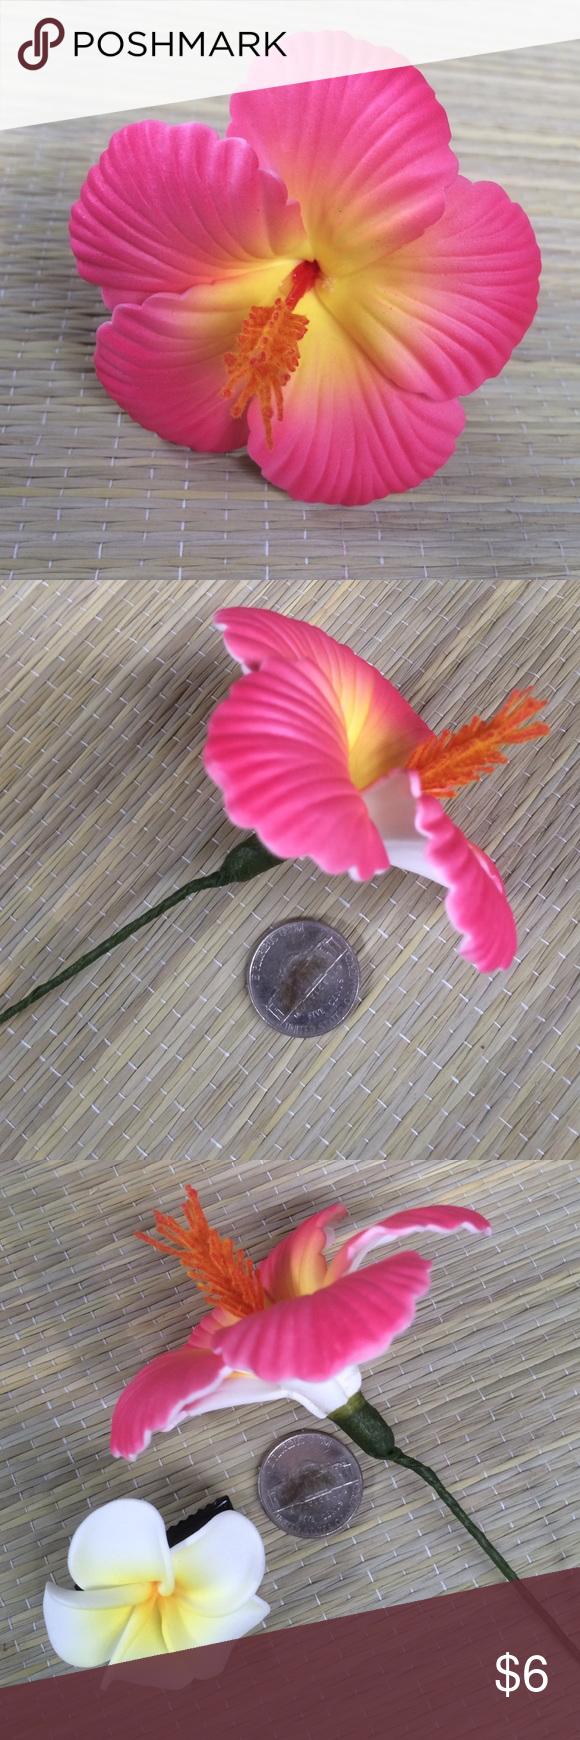 Faux pink hibiscus flower hair pic small clip my posh picks faux pink hibiscus flower hair pic small clip faux pink hibiscus flower hair pic small white plumeria hair clip delicate lightweight handmade in hawaii izmirmasajfo